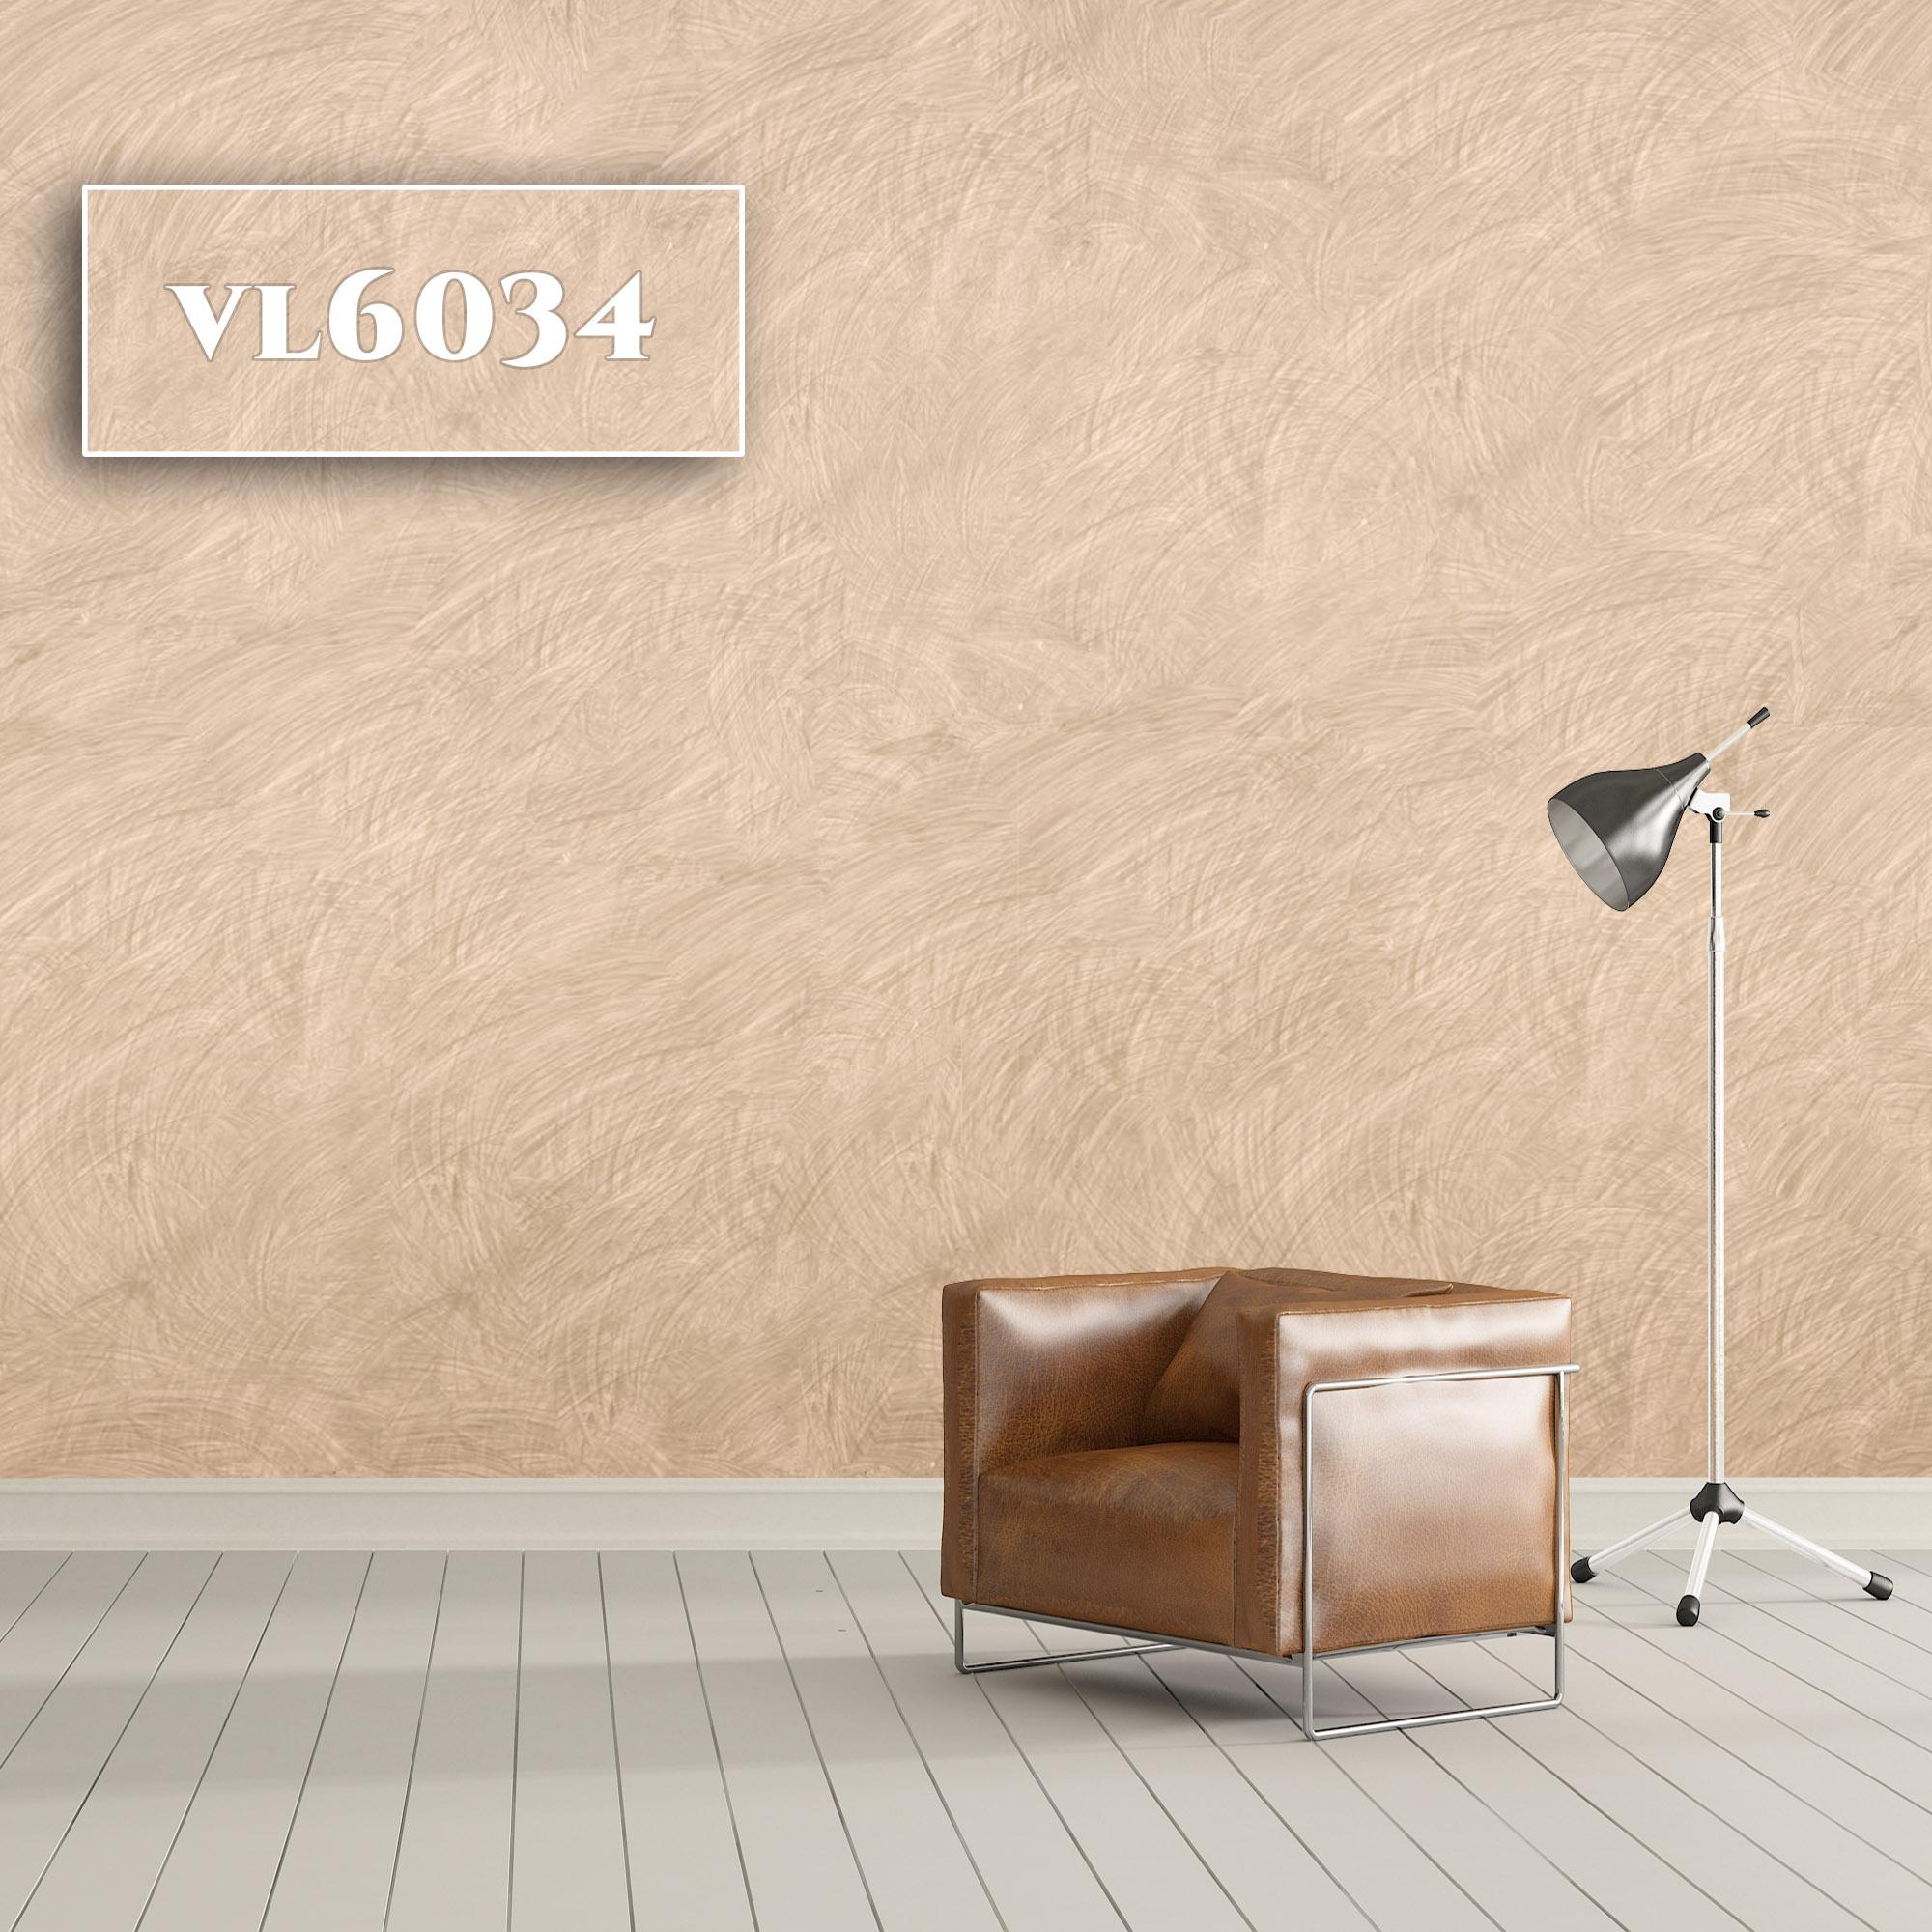 VL6034